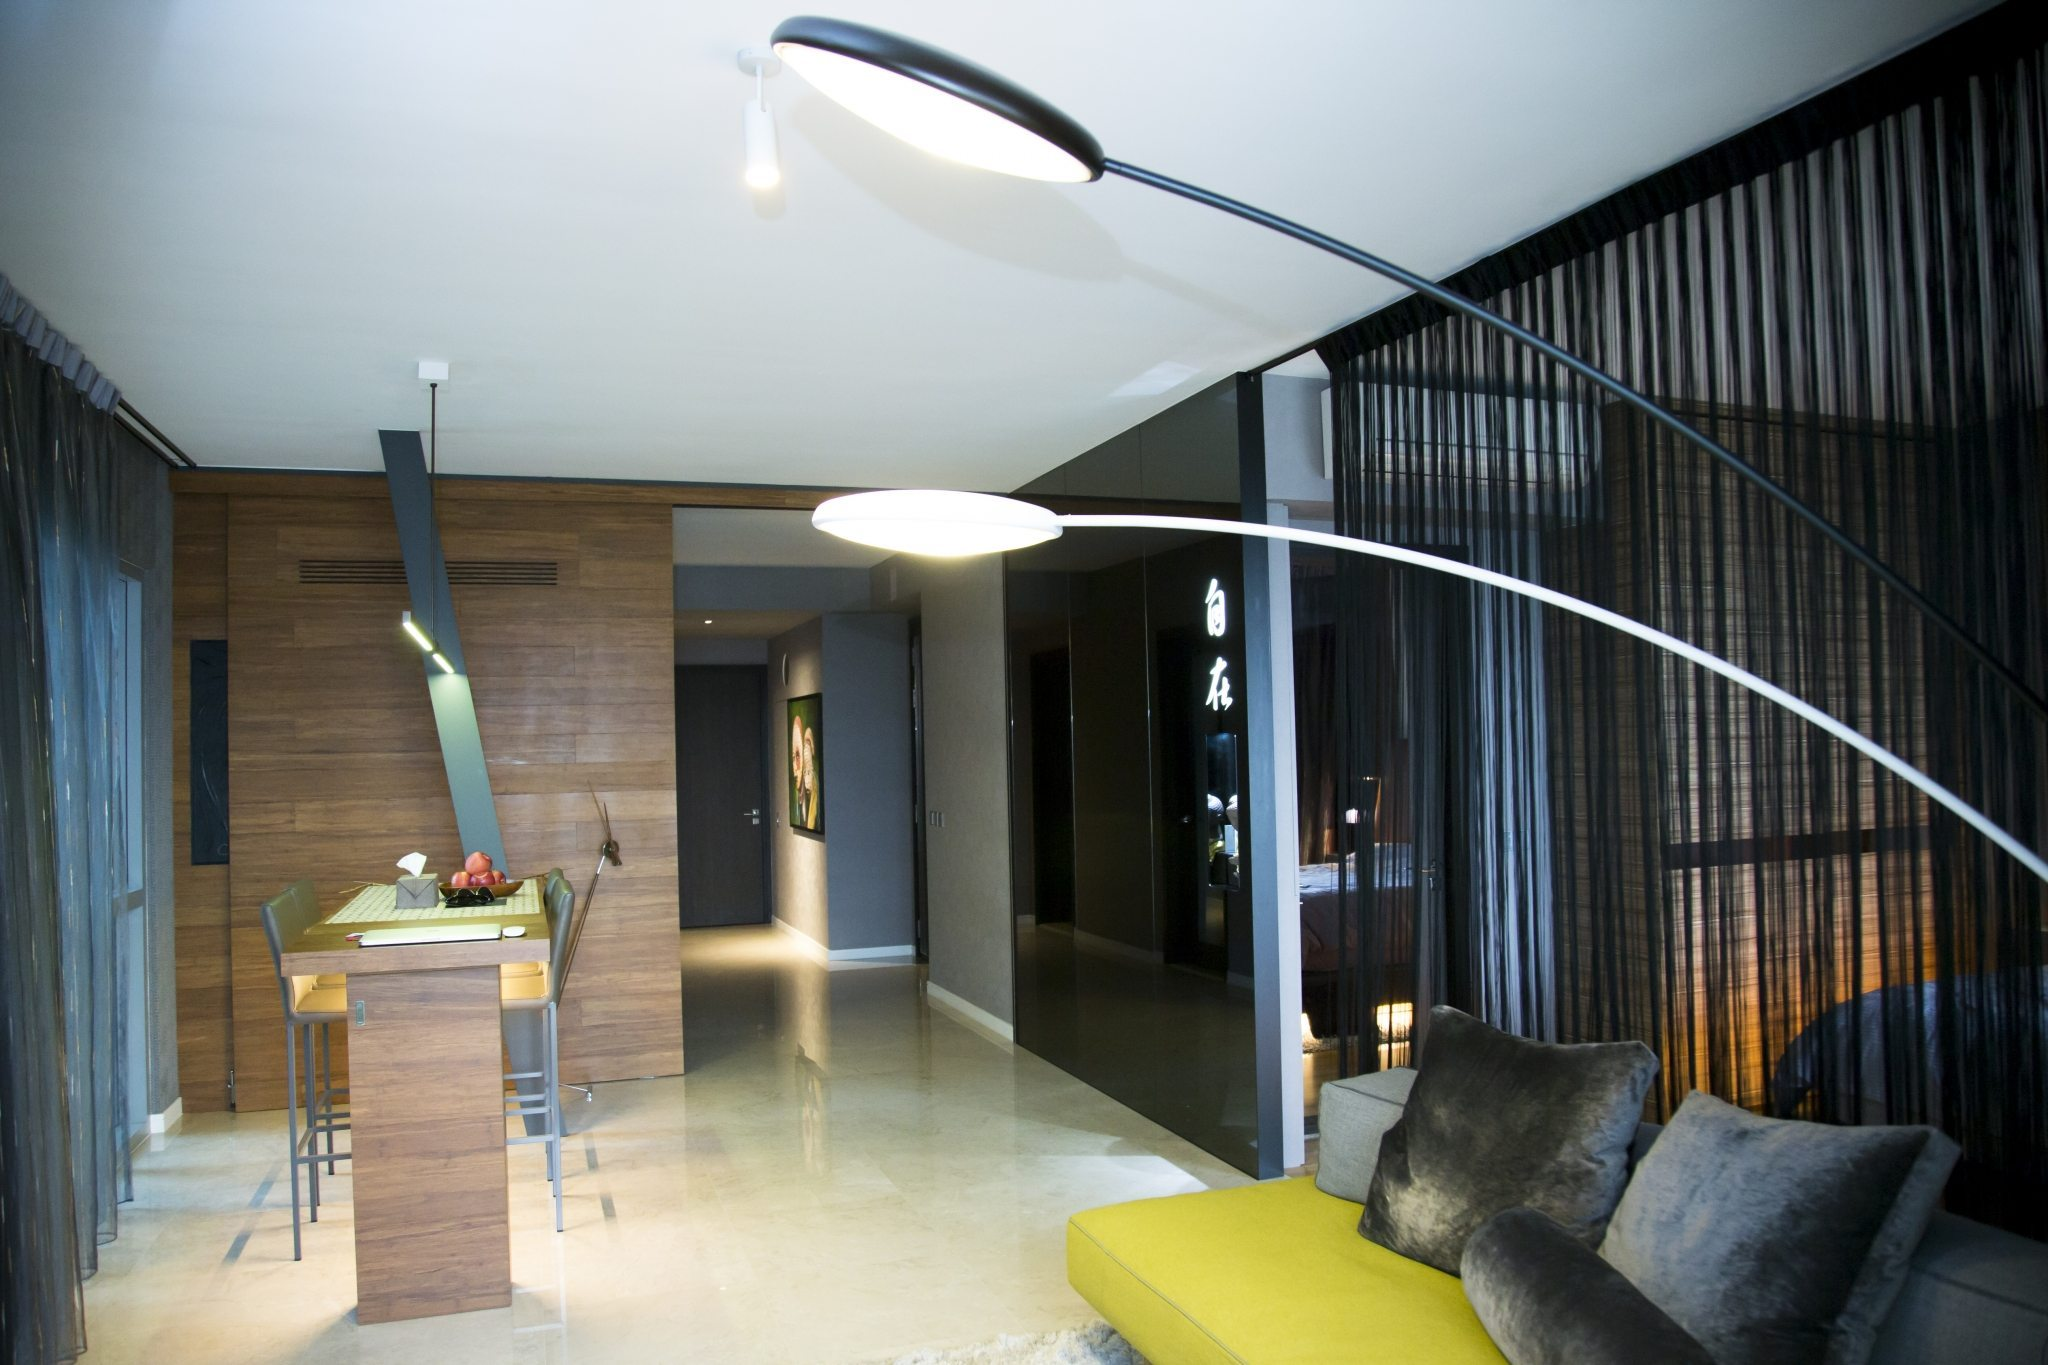 Ataz haus renovation interior design company for Grand designs 3d renovation interior